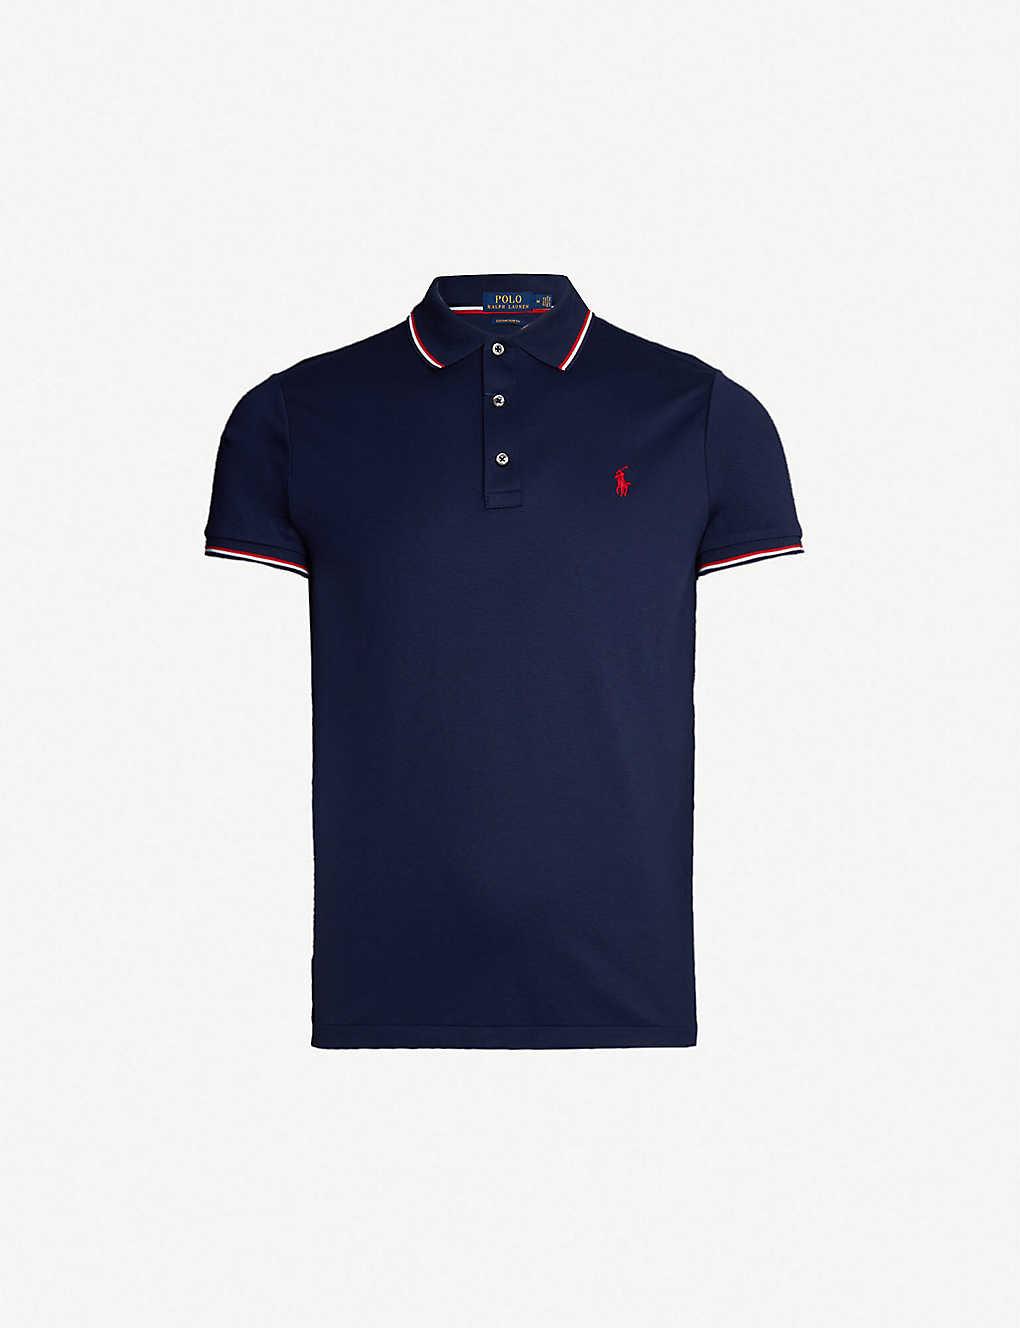 b1a1163a846 POLO RALPH LAUREN - Striped-trim cotton polo shirt